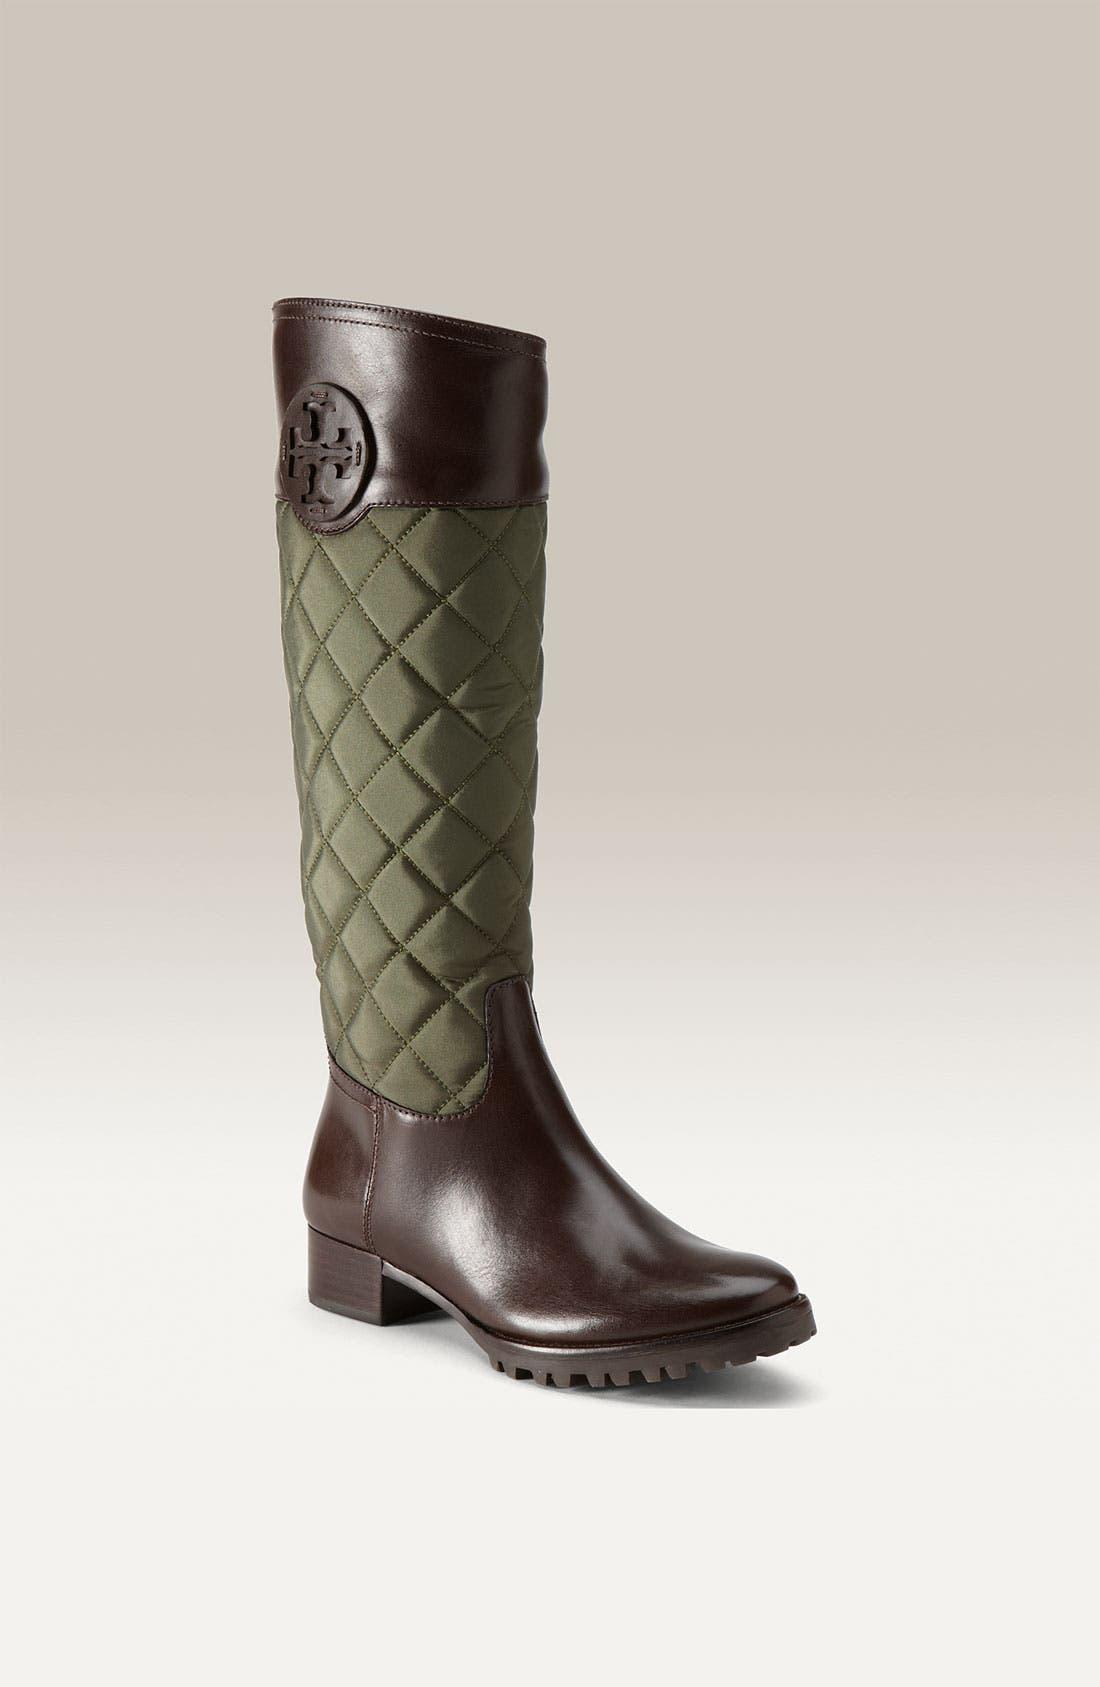 Main Image - Tory Burch 'Rowan' Boot